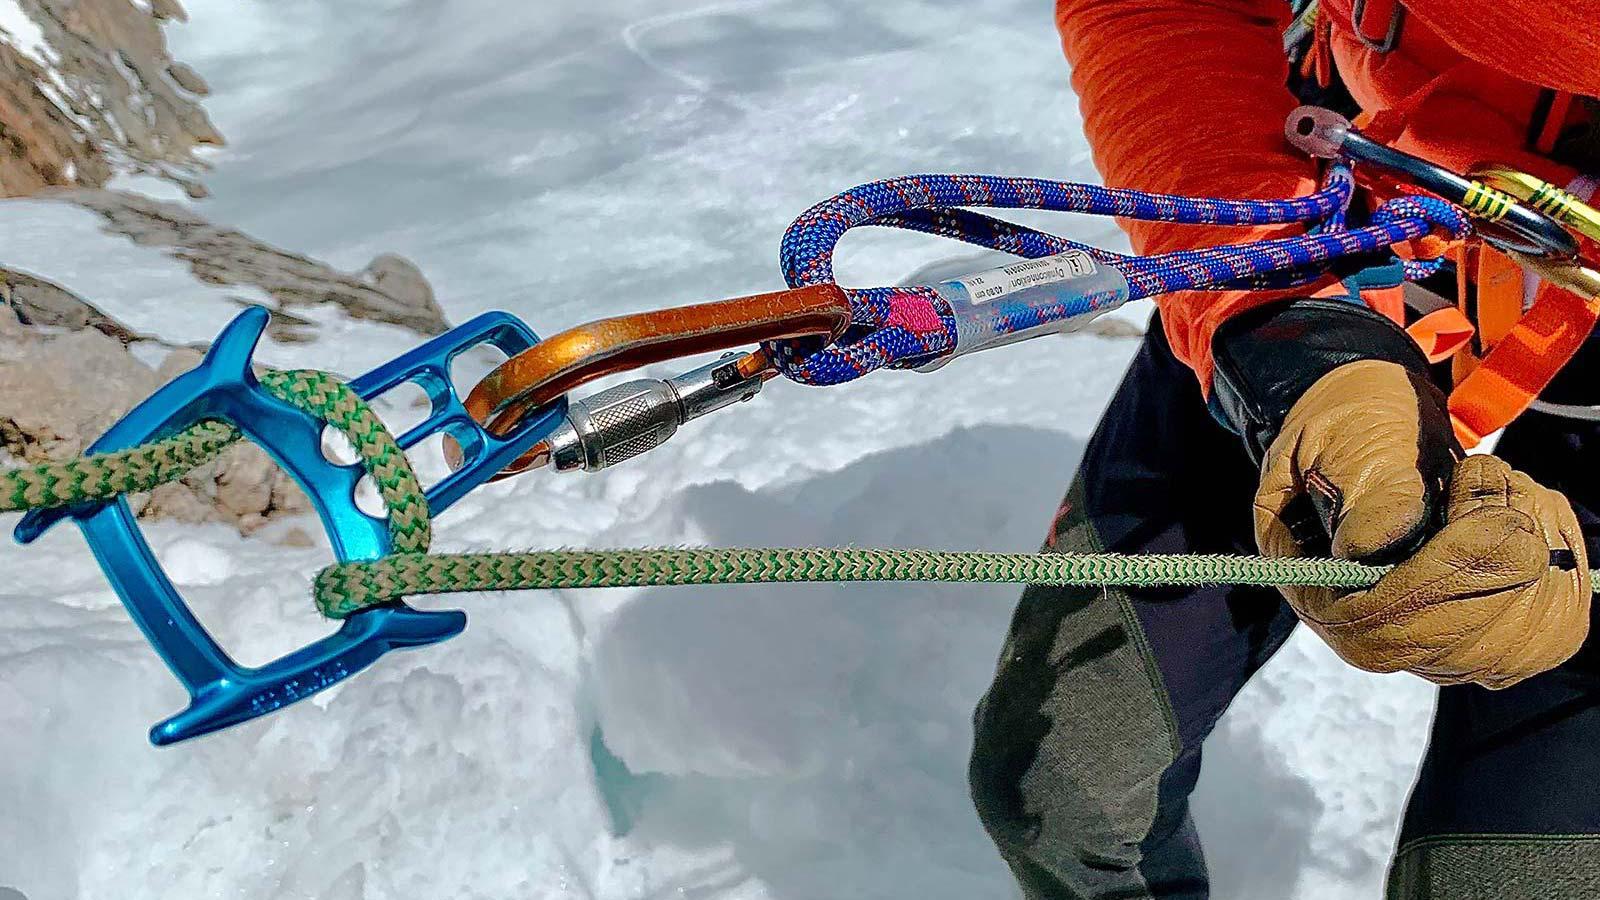 Dyneema Fortbildung I Alpine Kompetenz